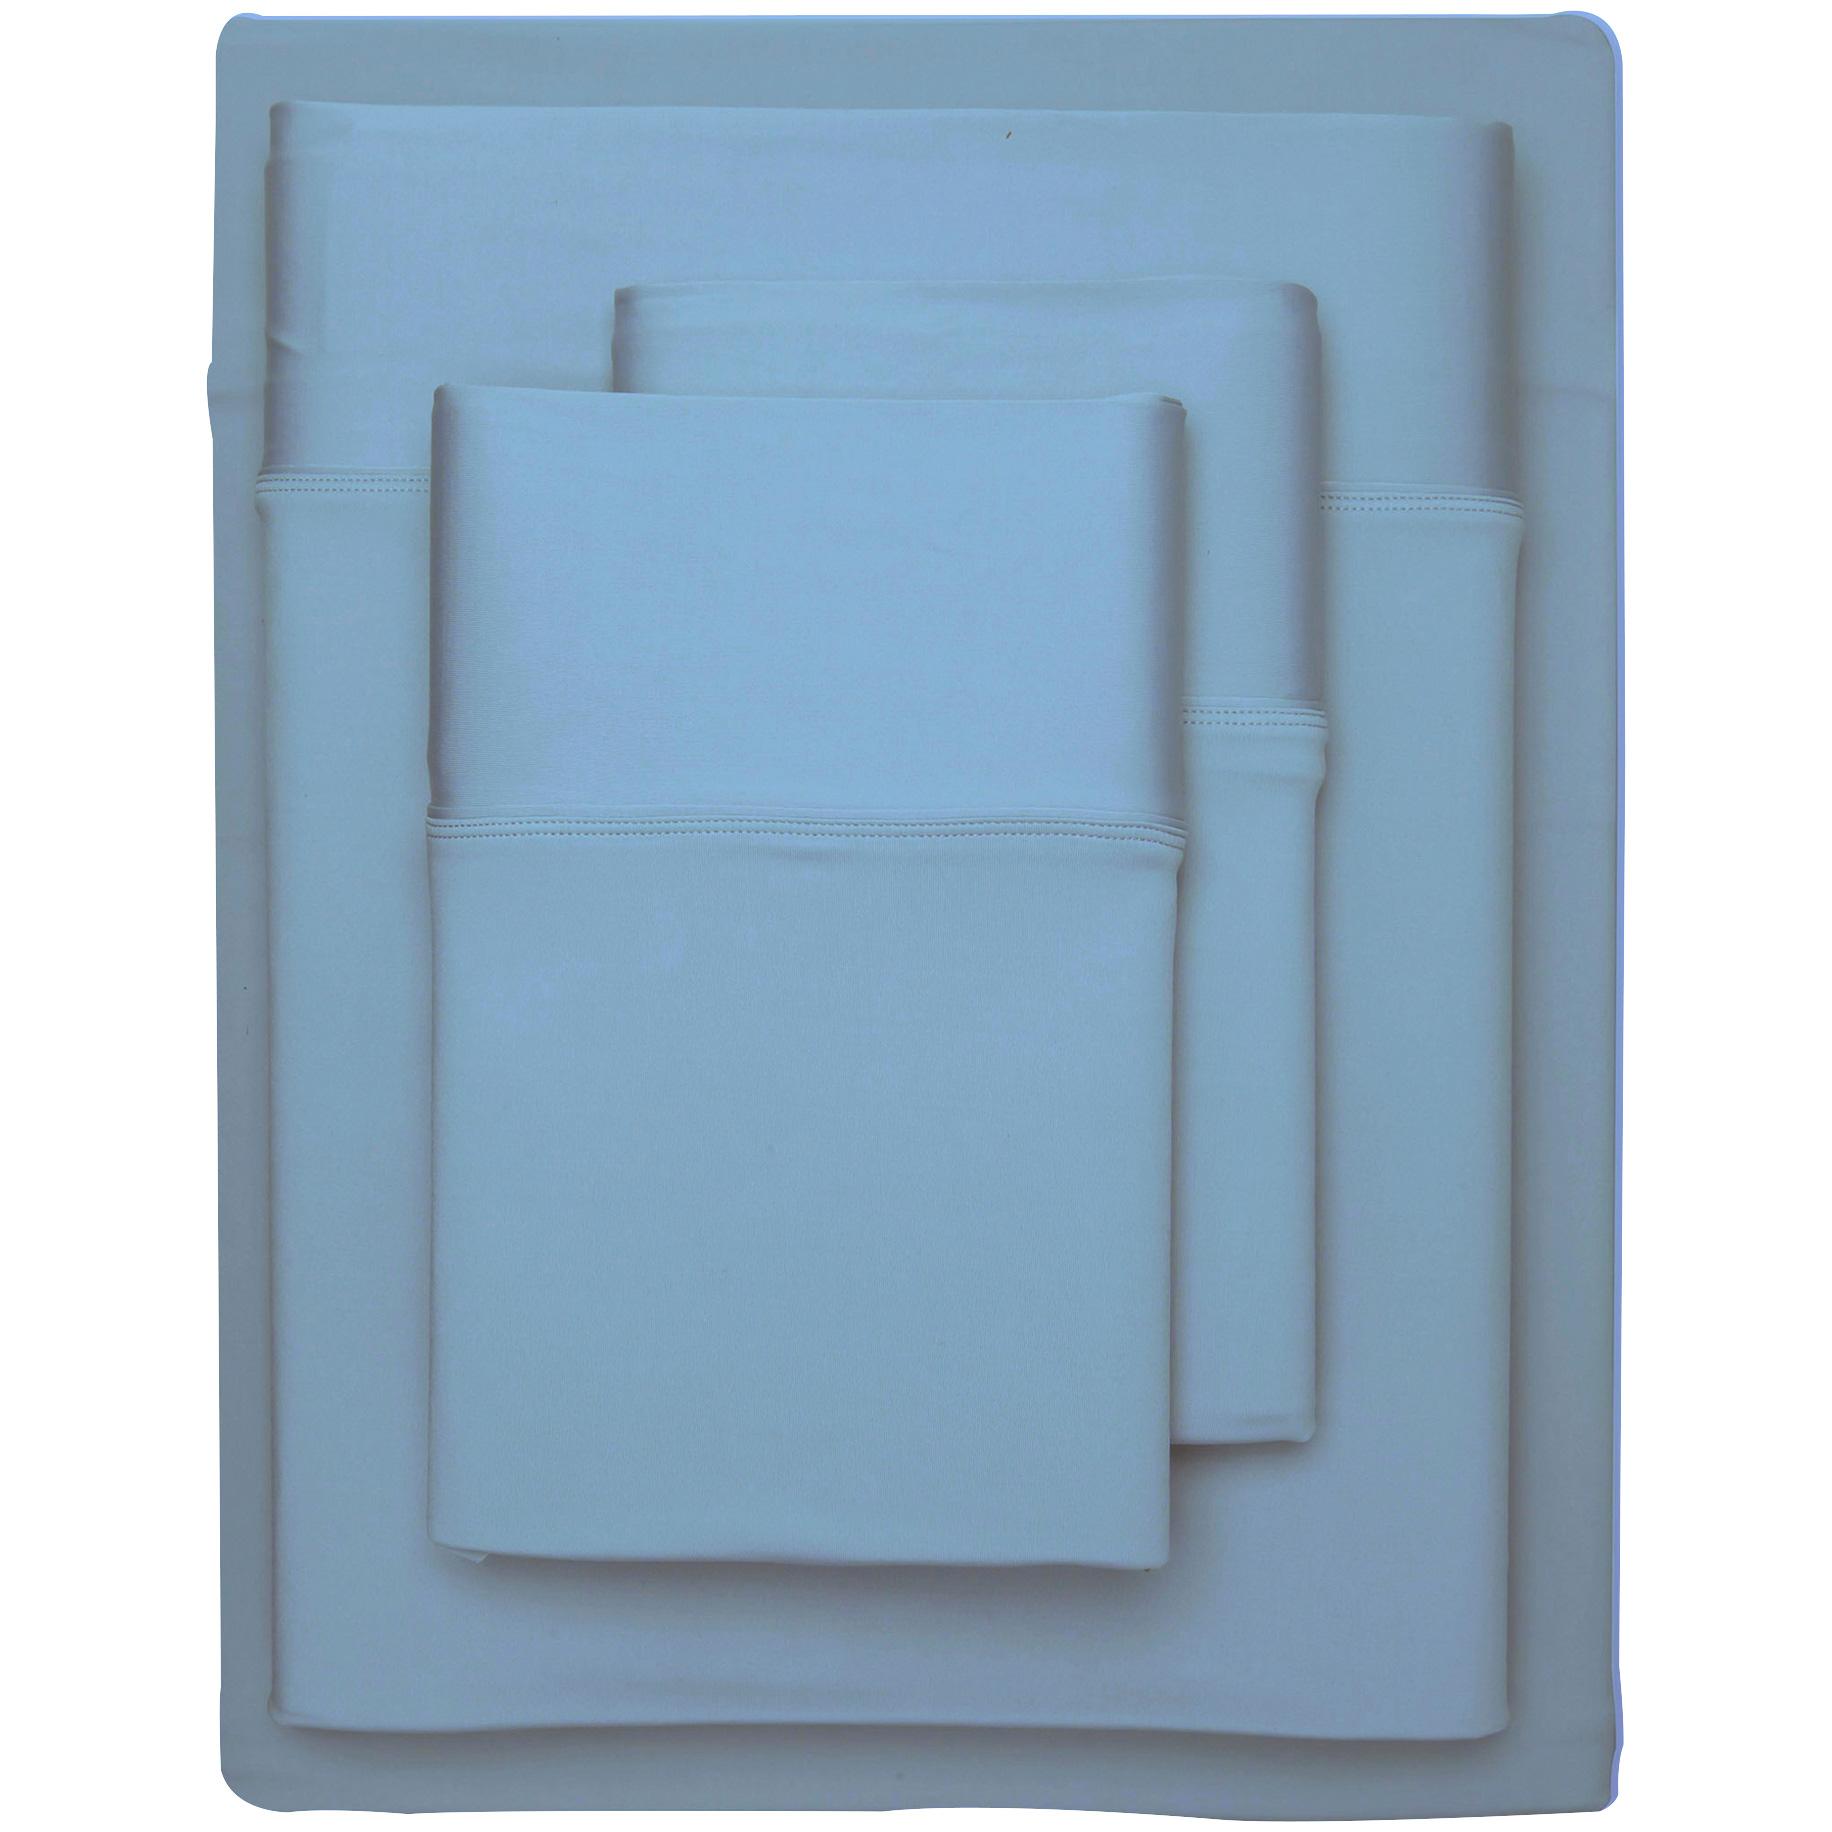 Sheex Inc. | SHEEX Aero Fit Carolina Blue Full Sheet Set